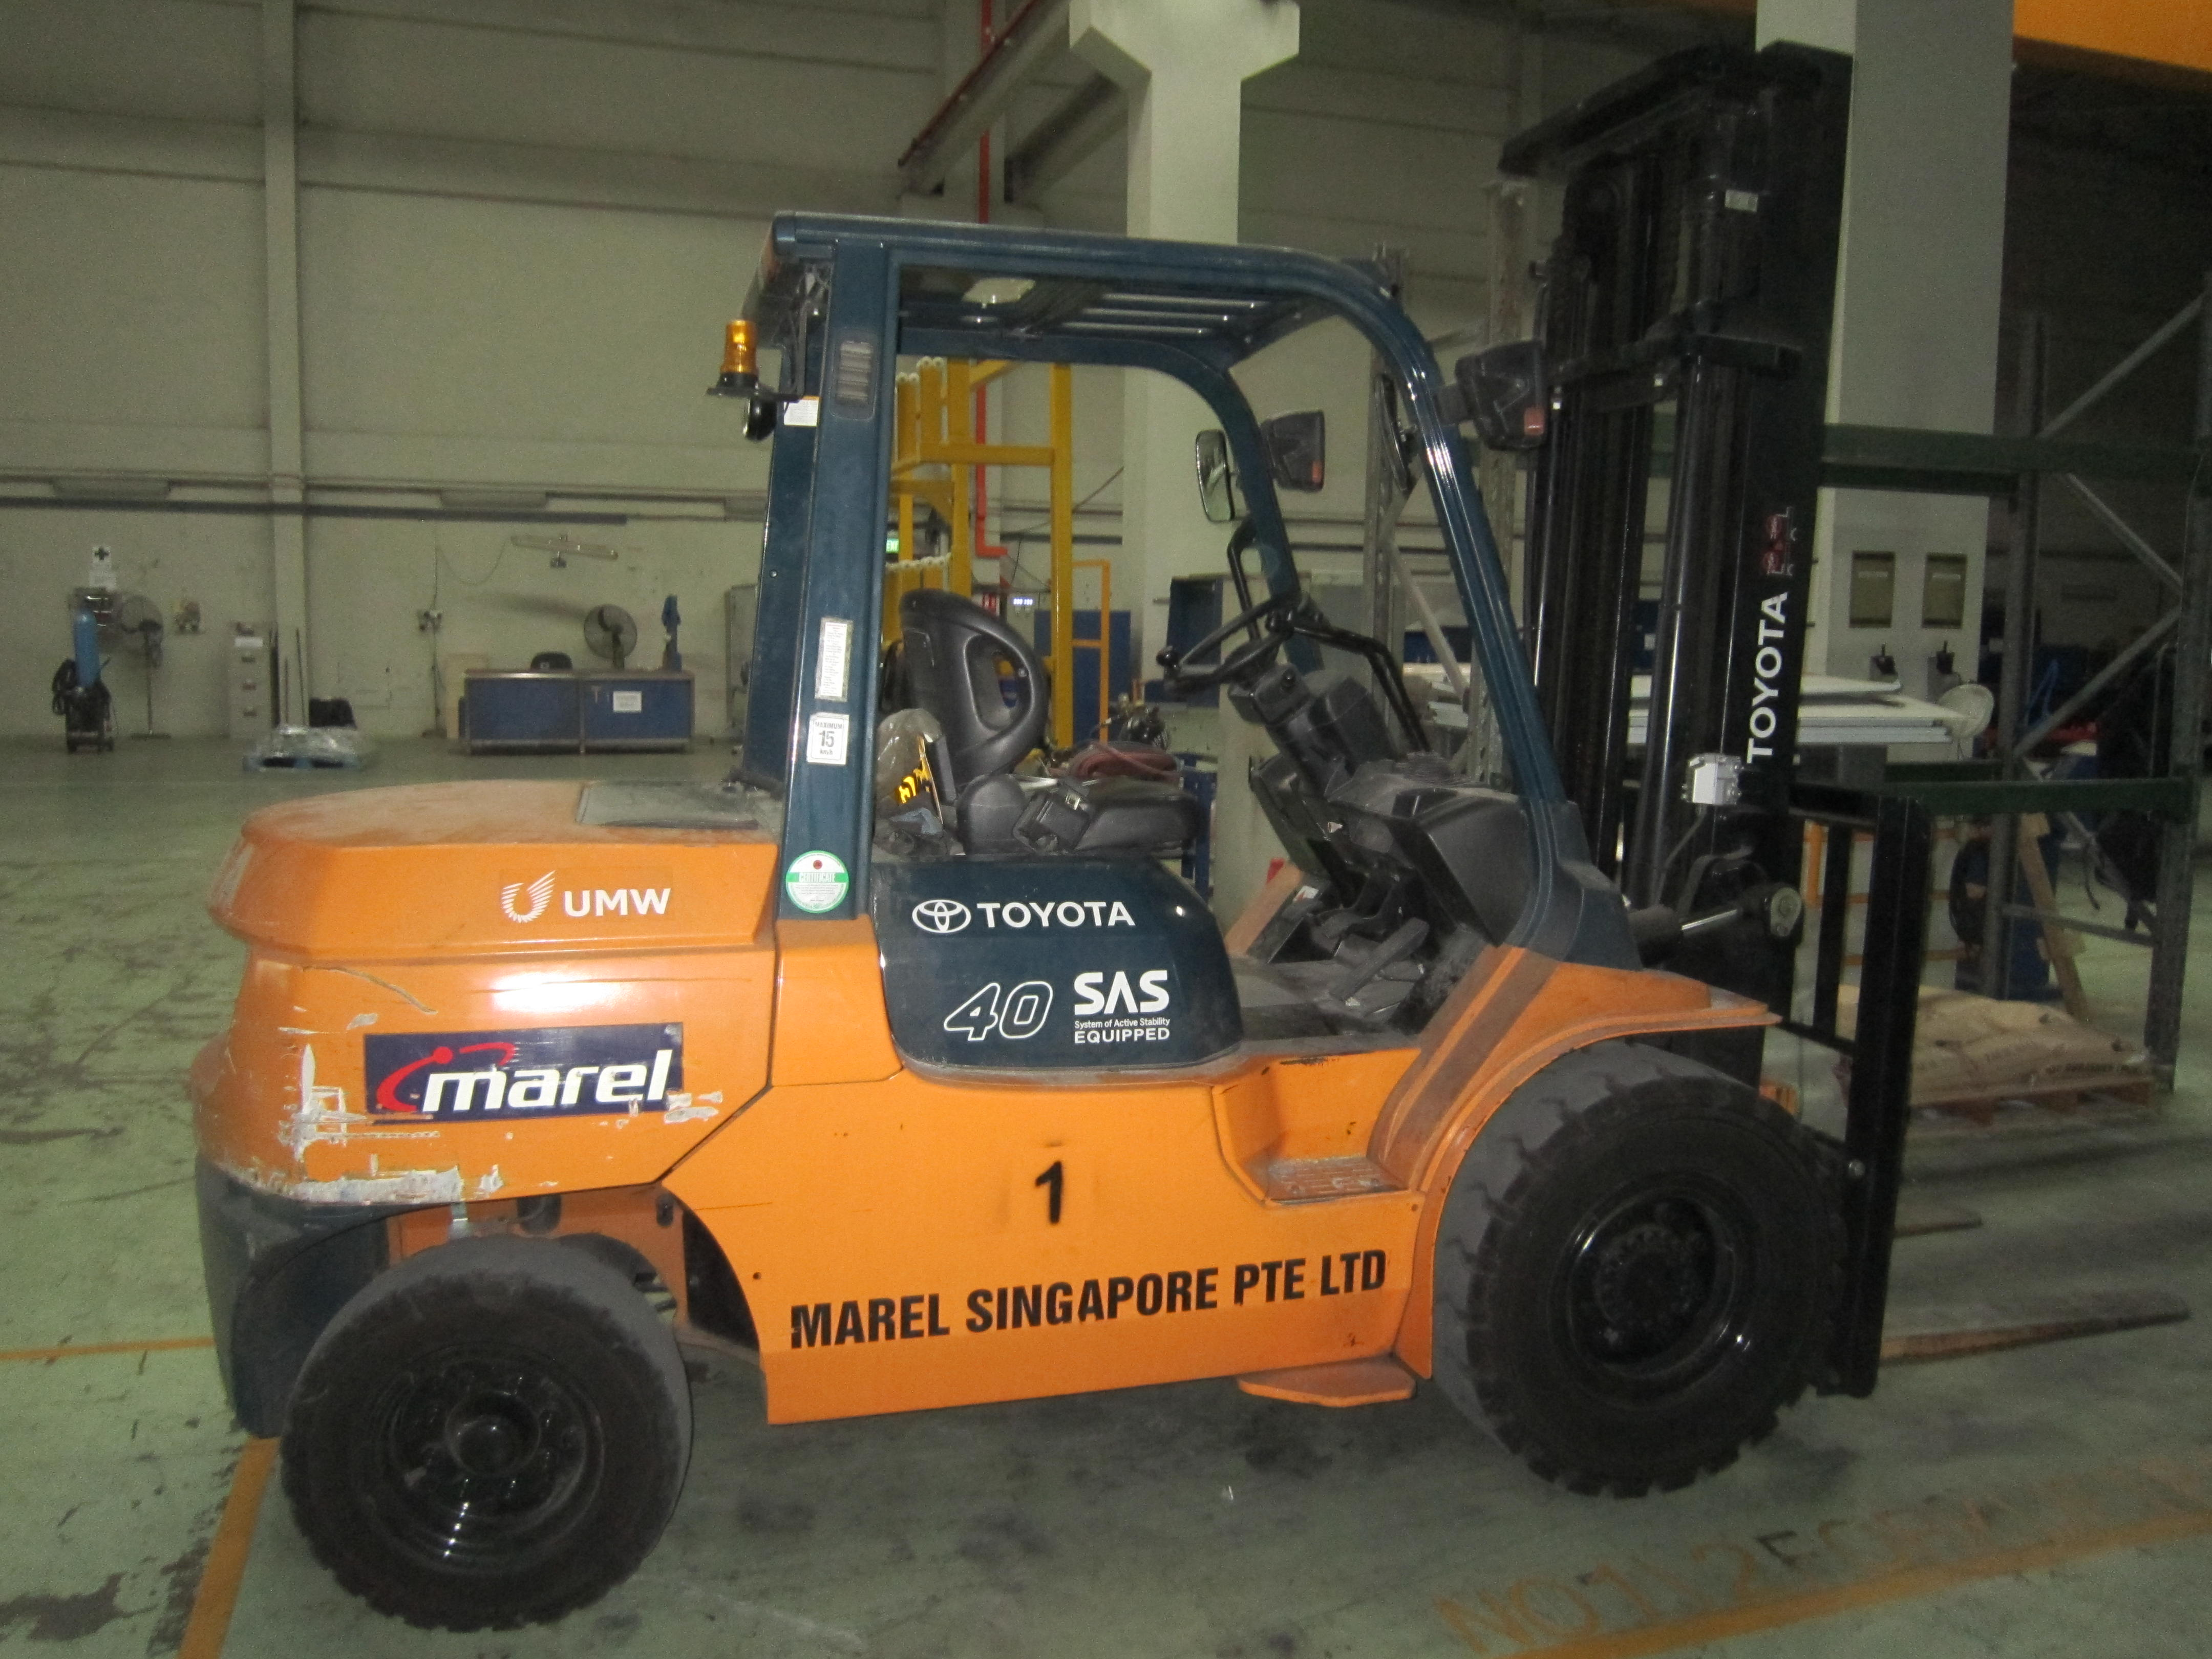 Marel Singapore Pte Ltd - UTB Industry Plant & Machinery